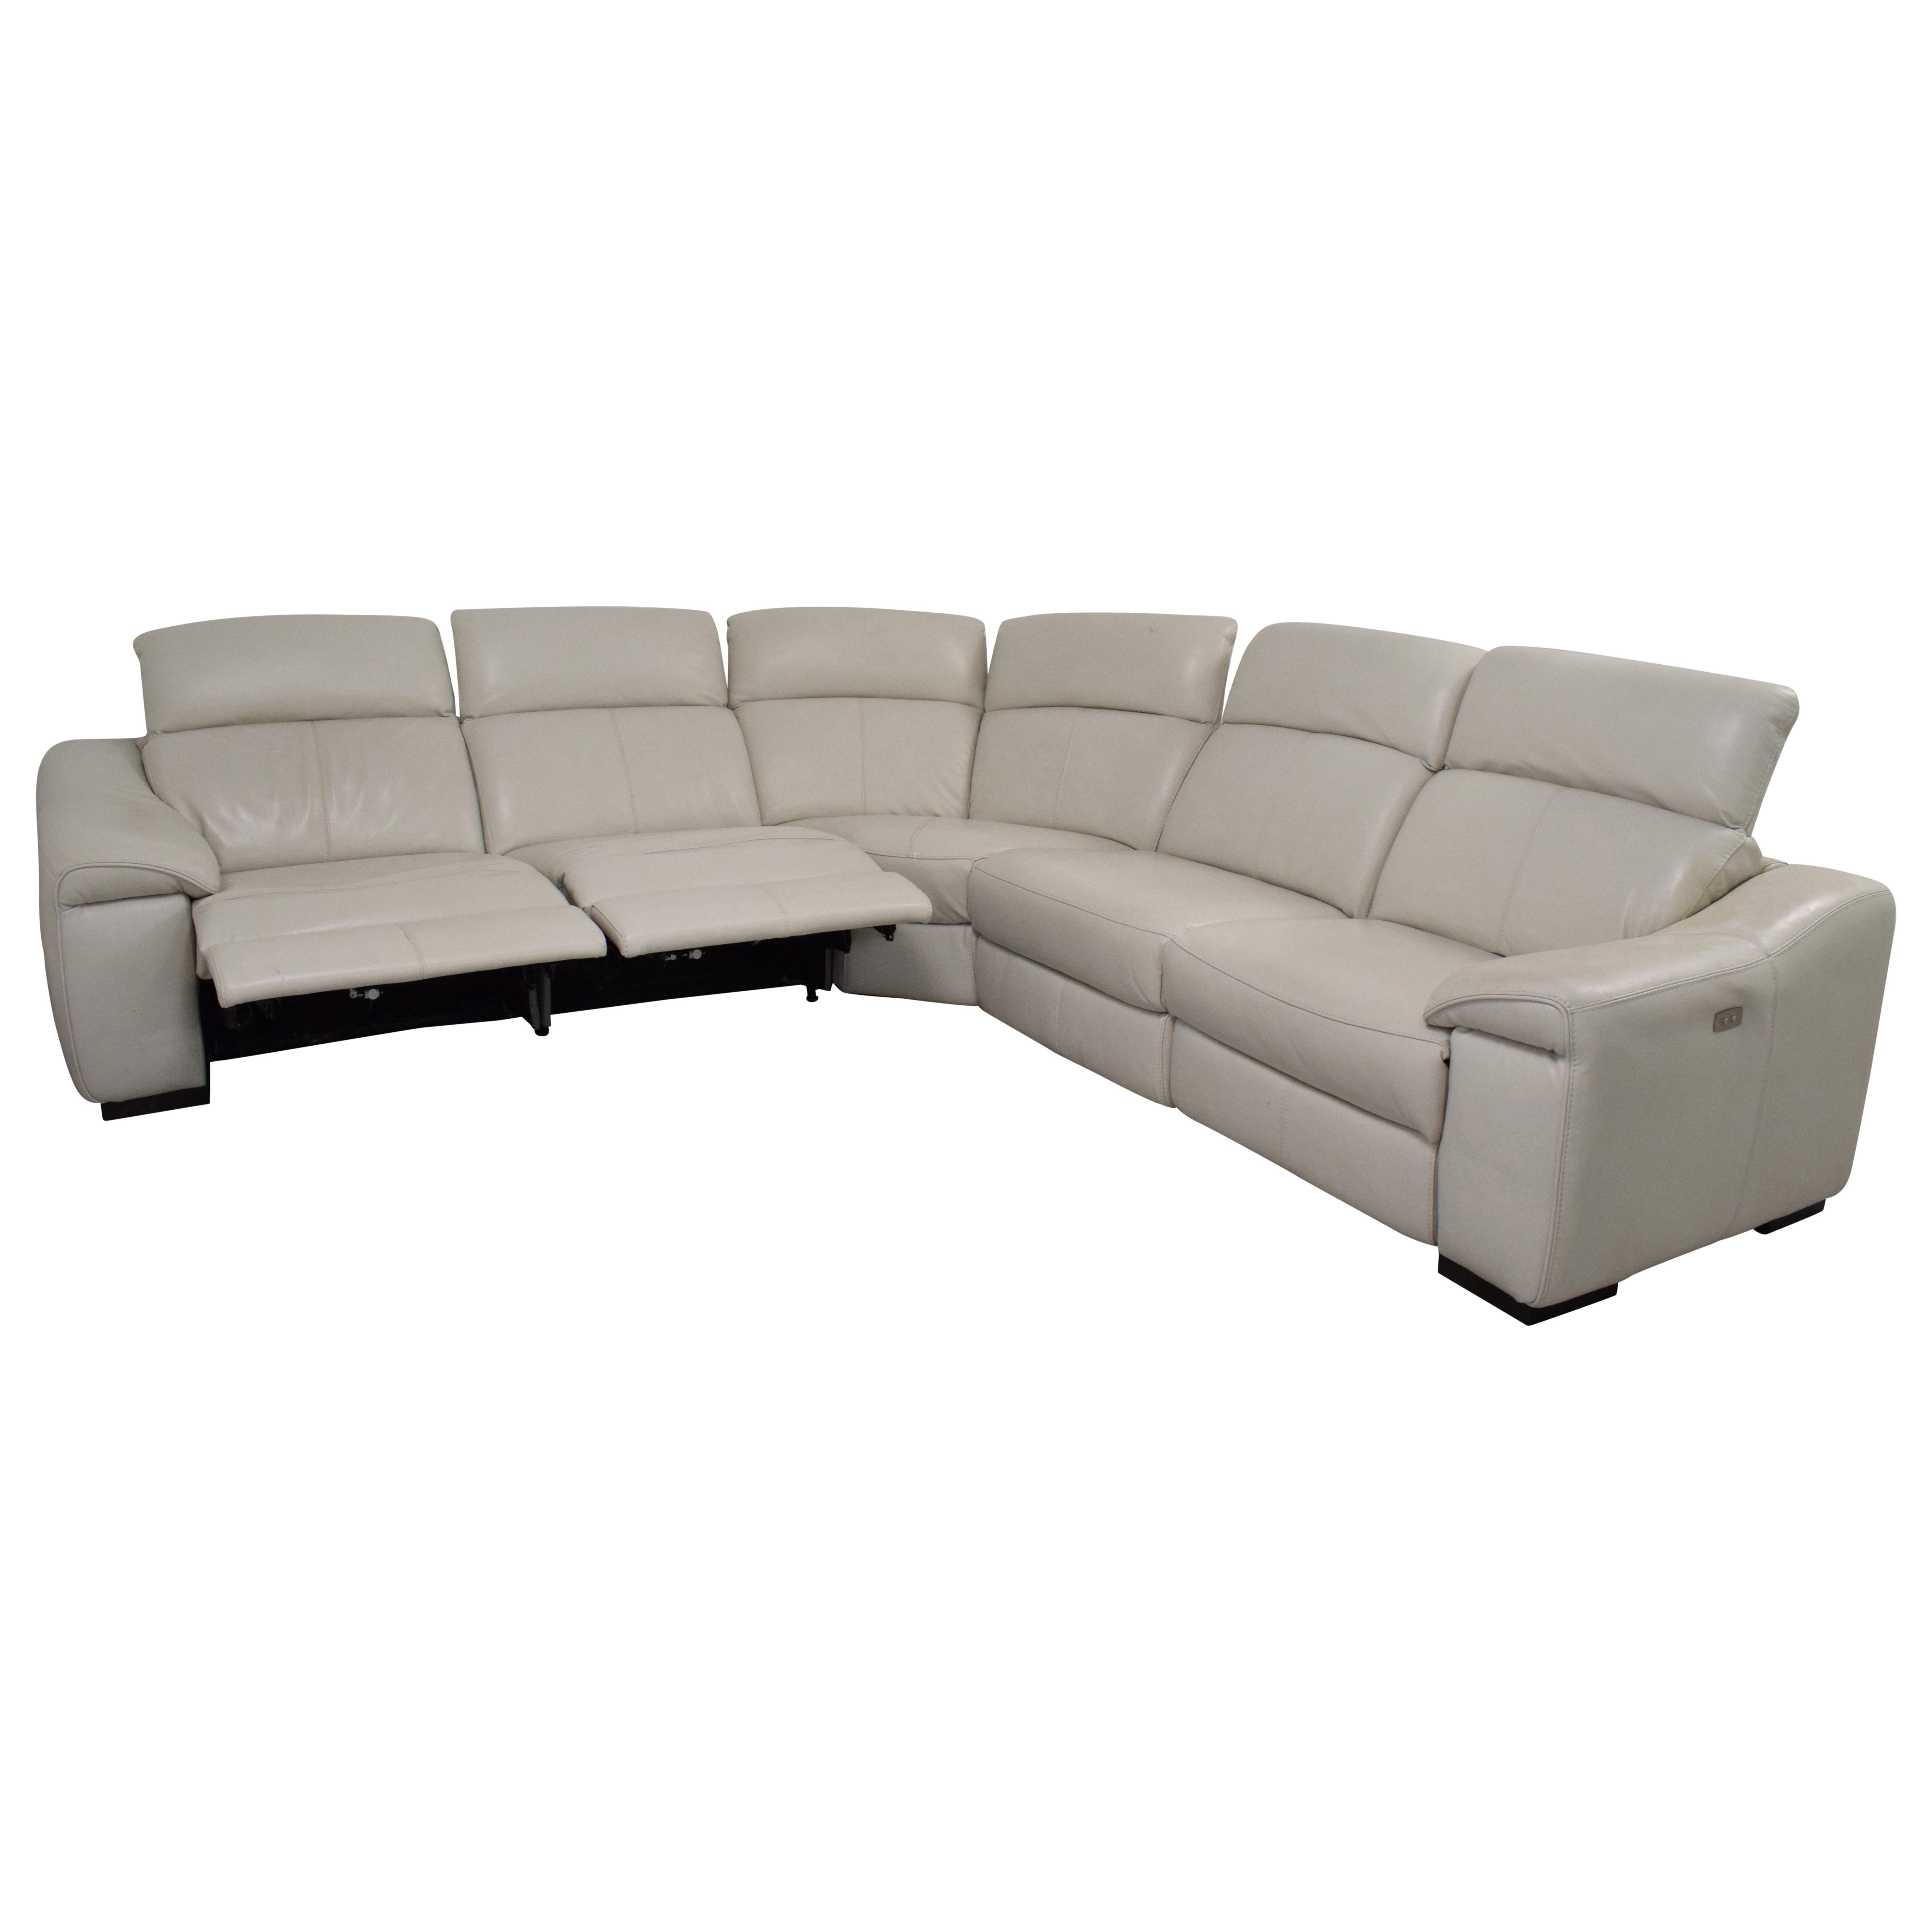 87 Off Macy S Macy S Power Reclining Sectional Sofa Sofas